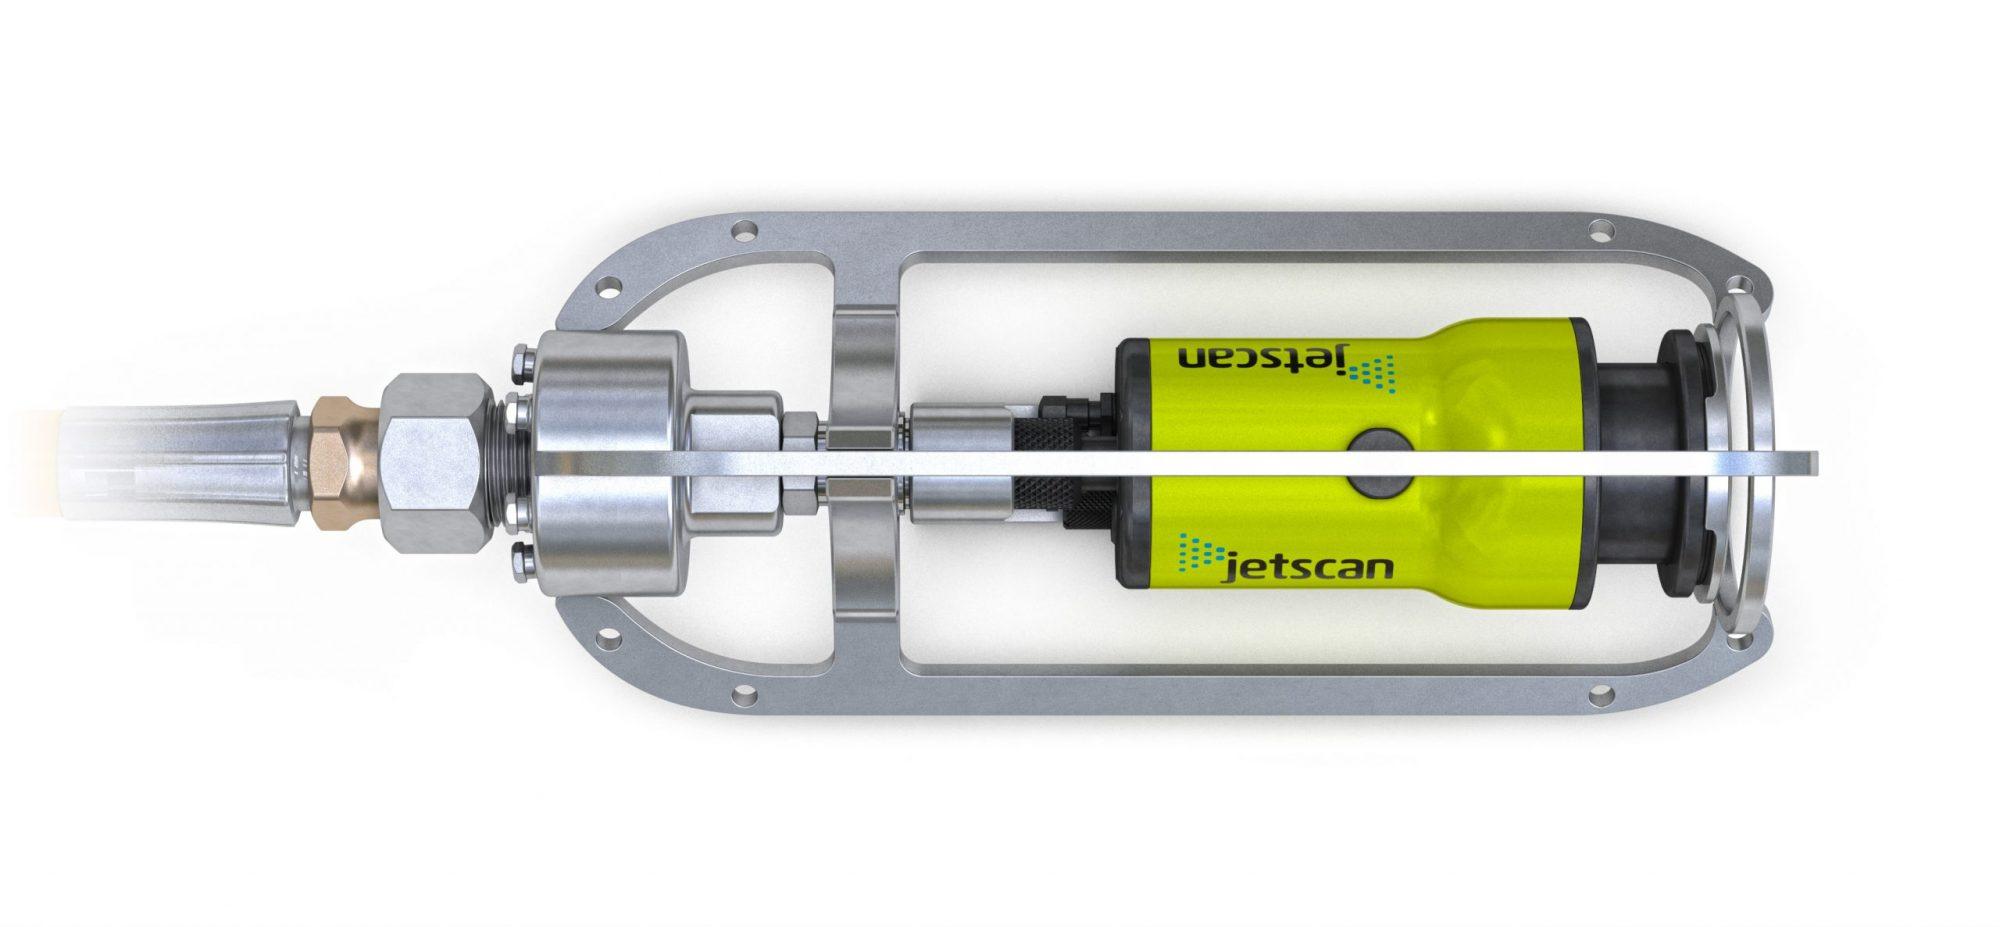 Jetscan Inspection Nozzle Camera